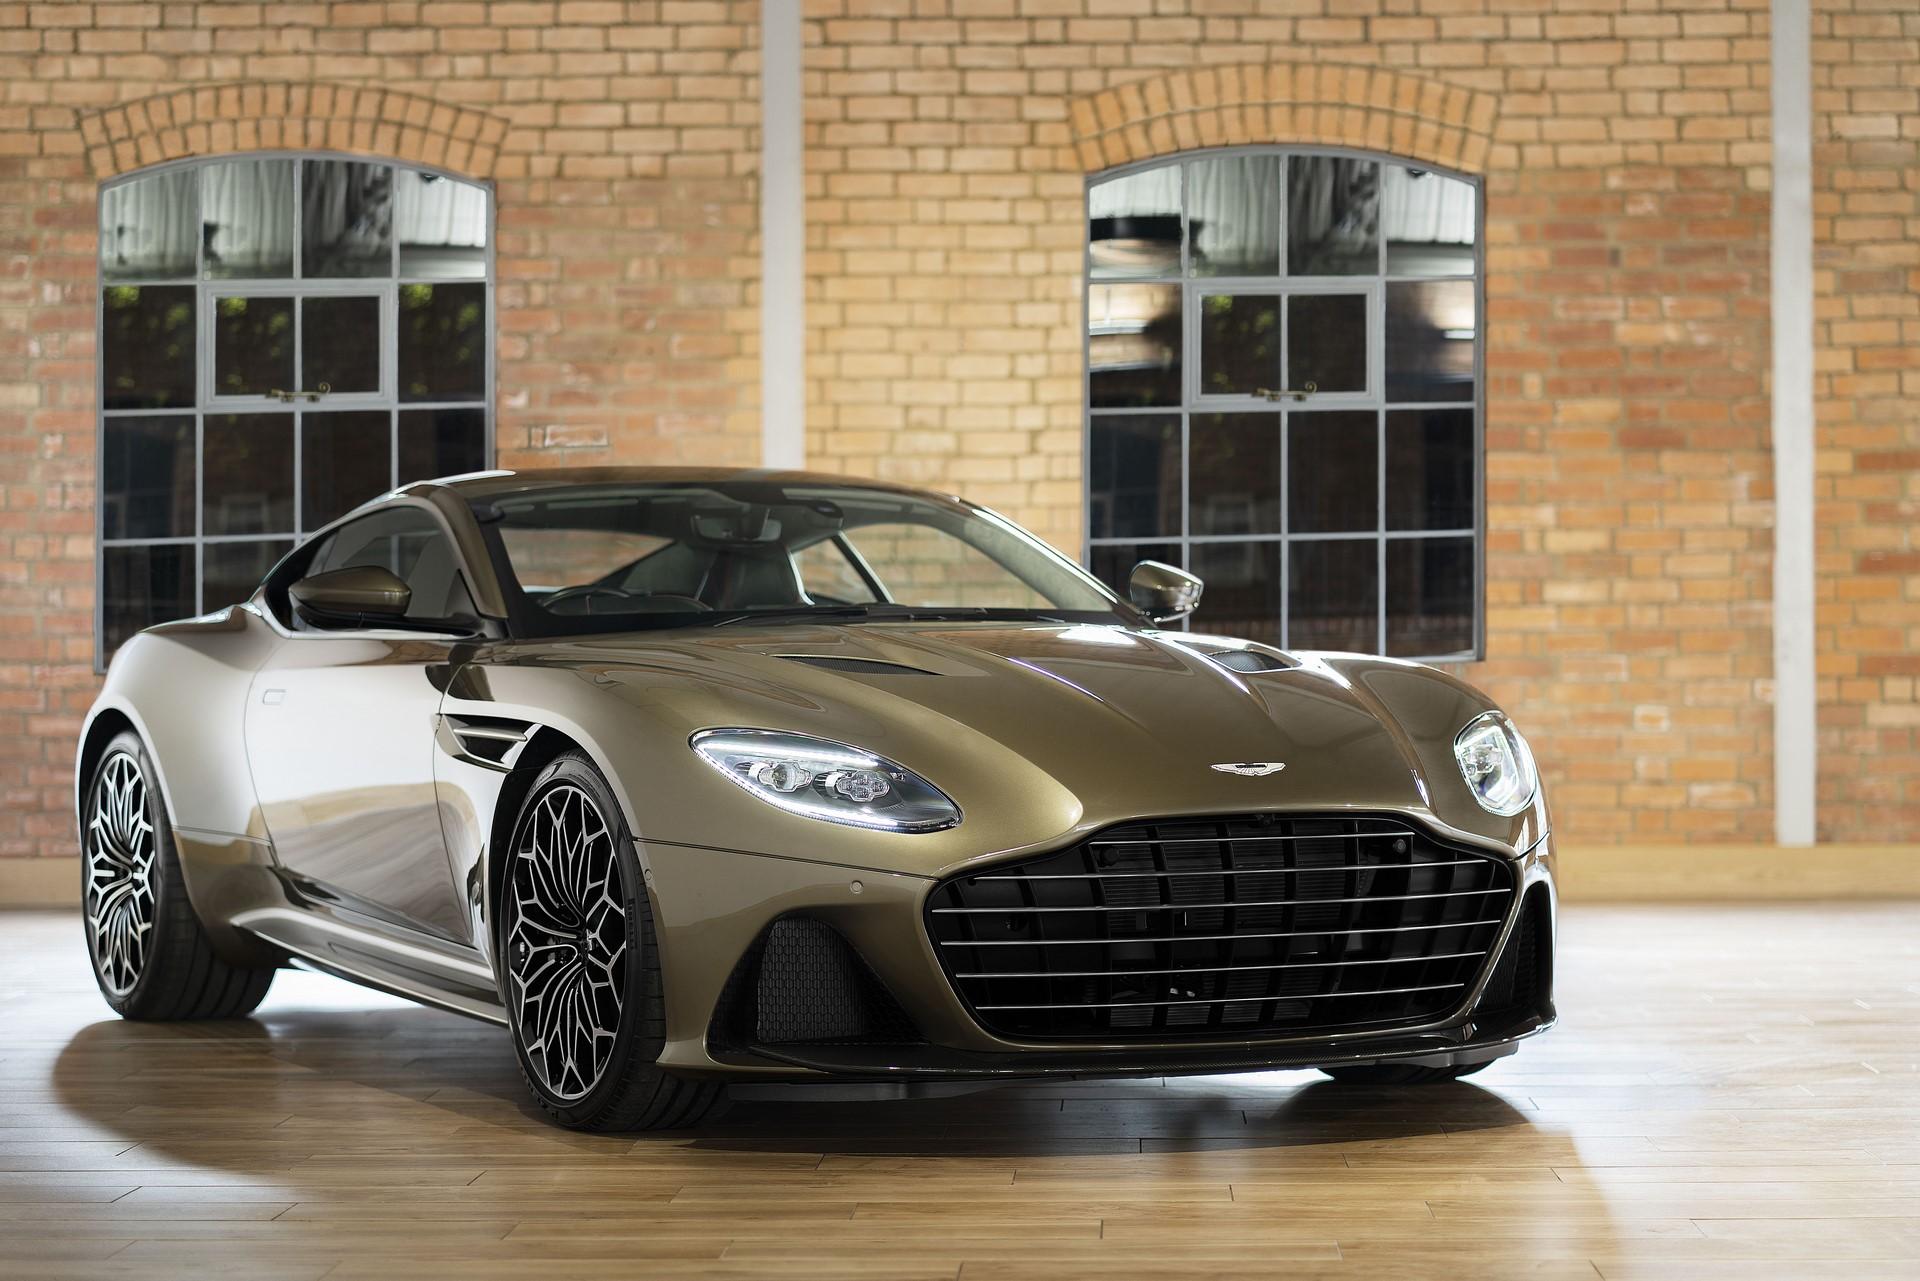 Aston-Martin-DBS-Superleggera-James-Bond-Special-Edition-3